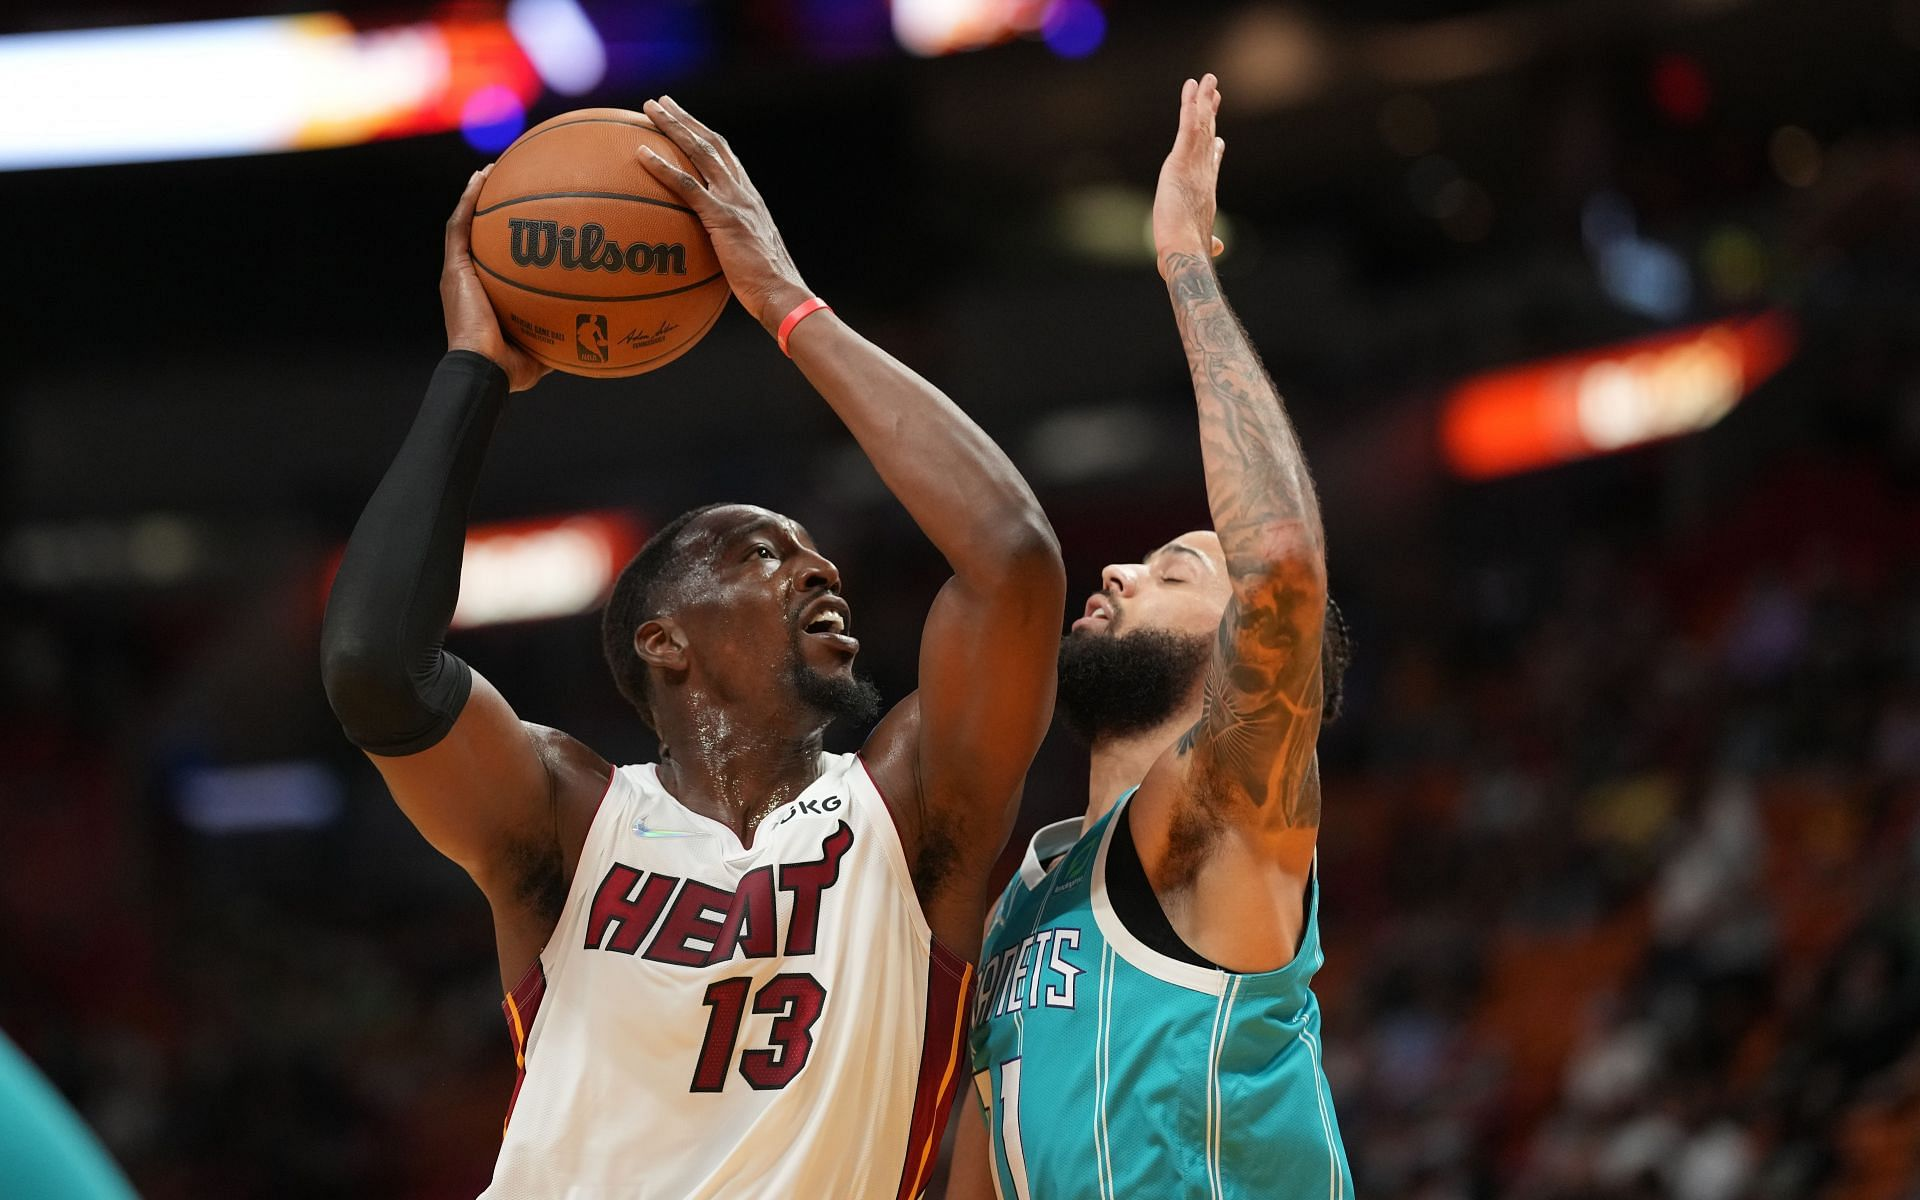 Bam Adebayo of the Miami Heat attempts a hook shot